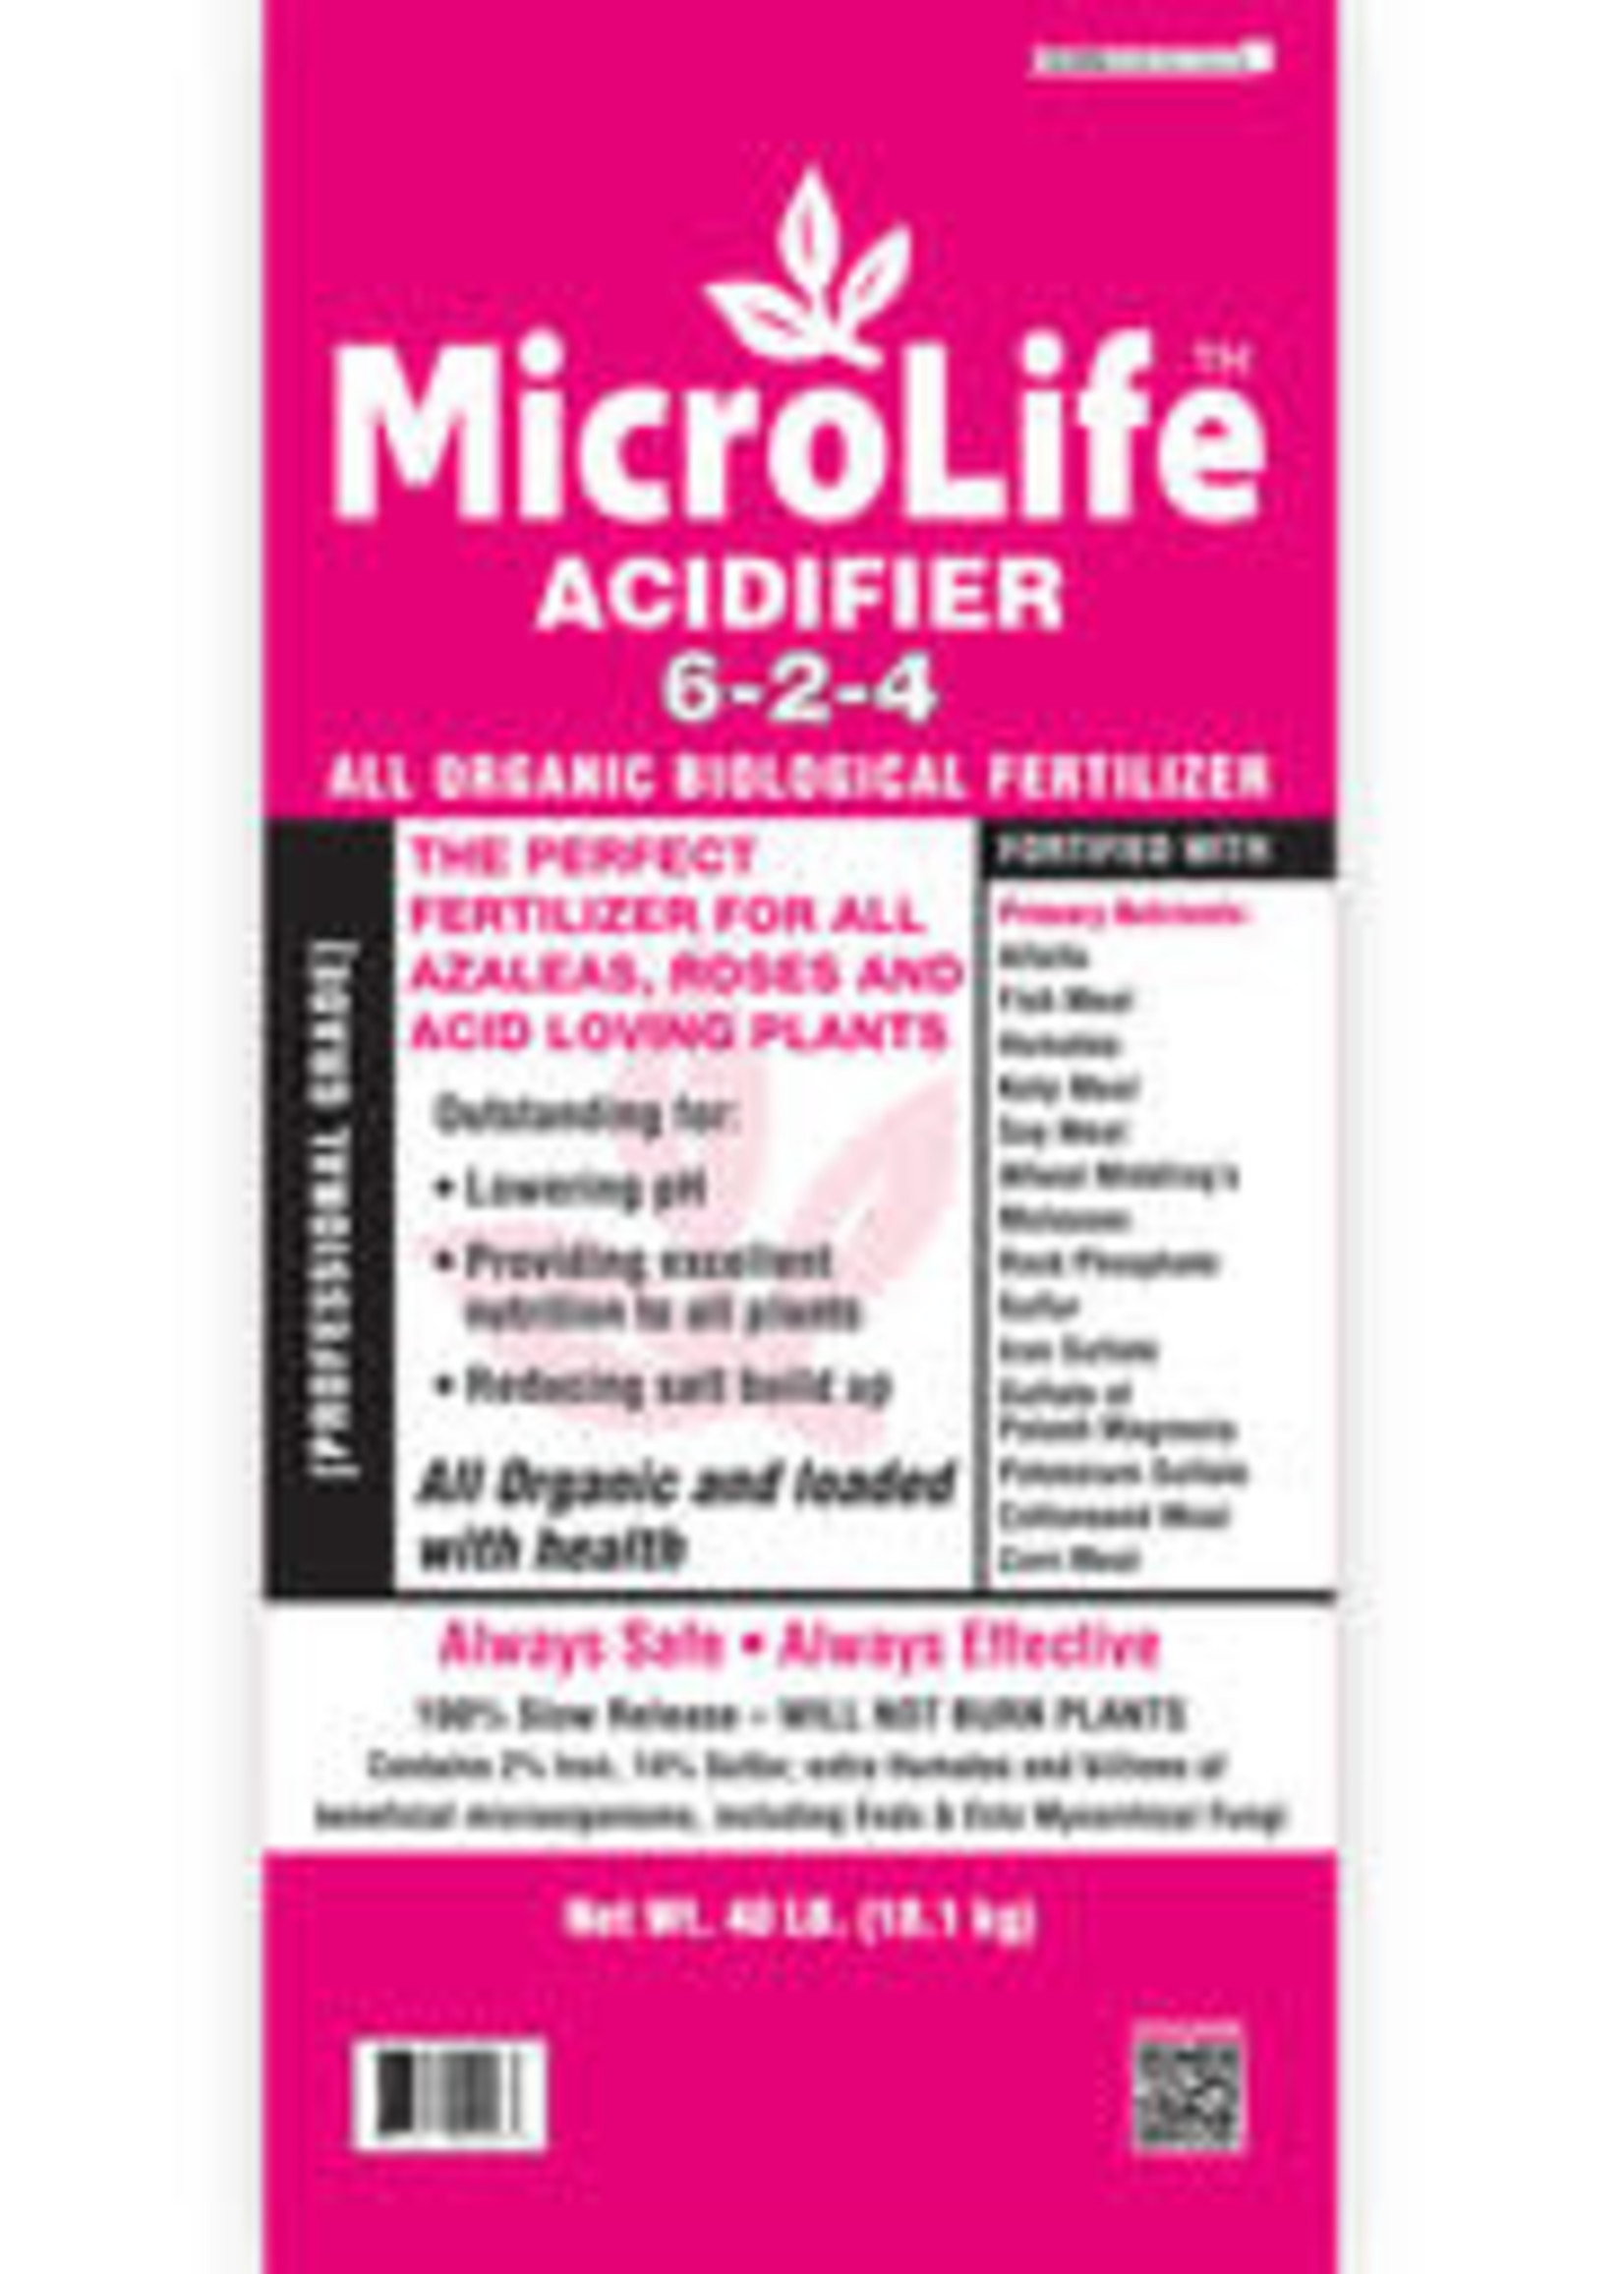 MicroLife Azalea Fertilizer 6-2-4 40 lb. bag